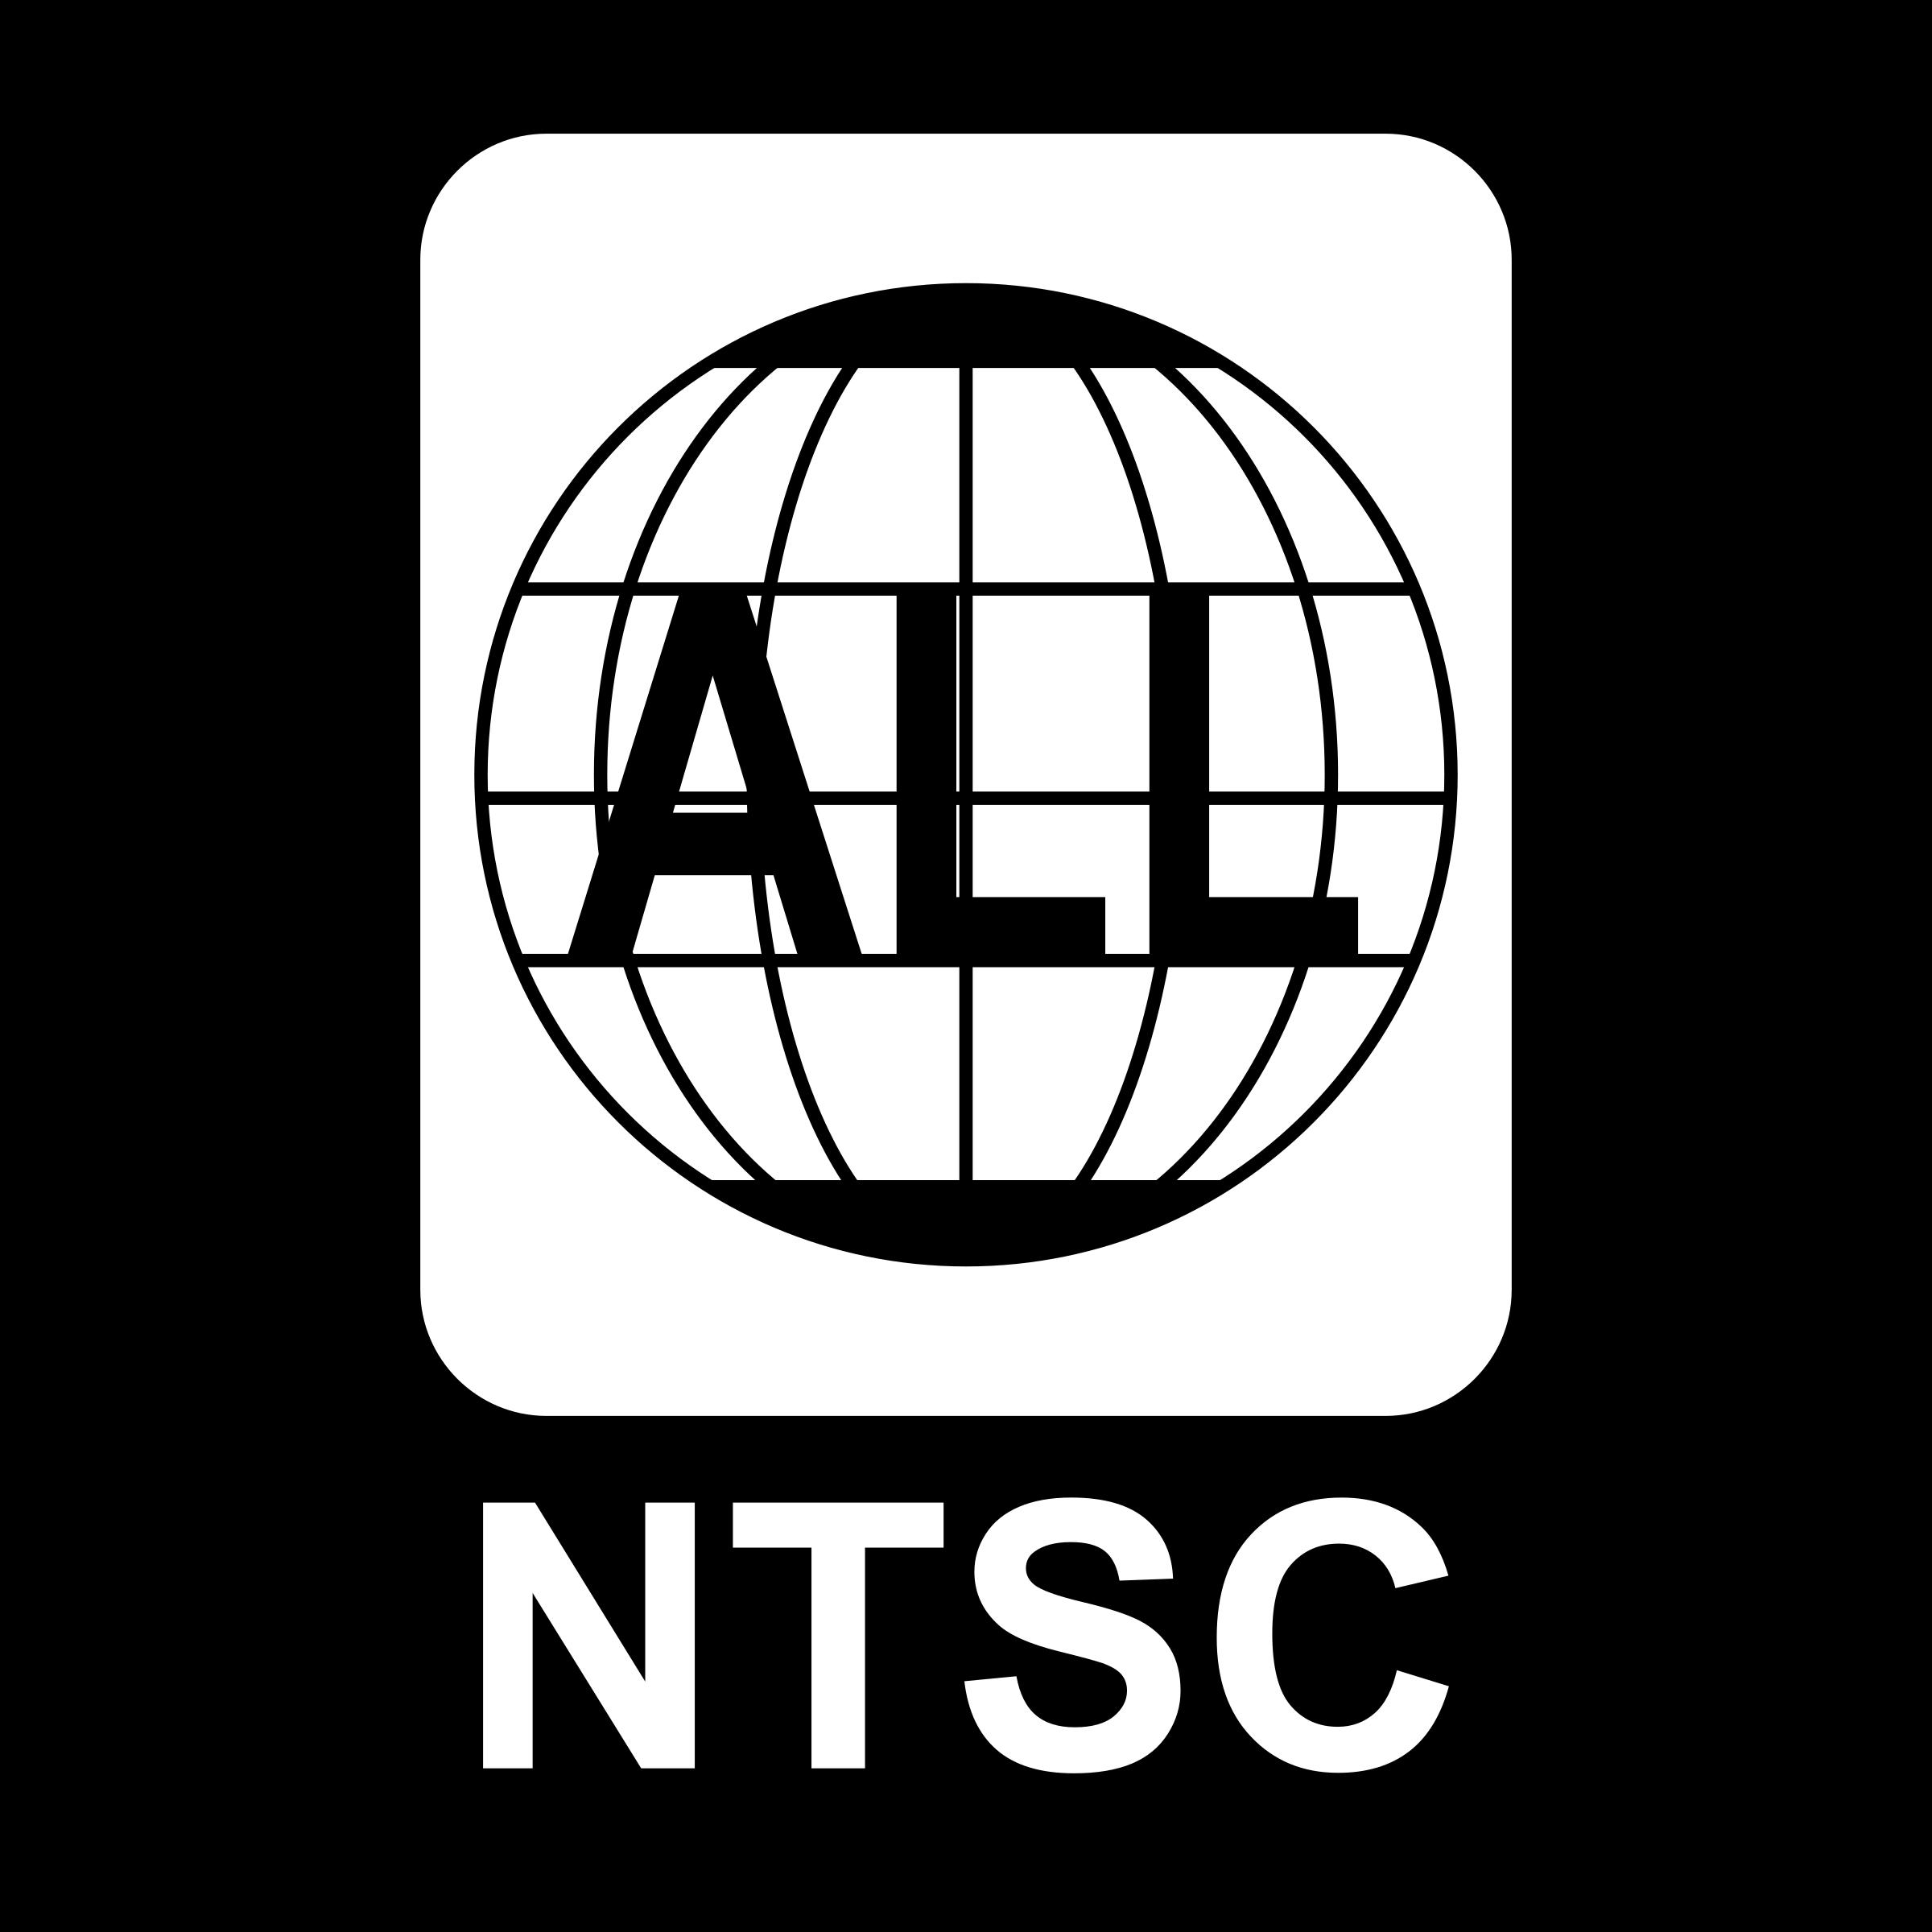 all ntsc 01 logo png transparent svg vector freebie supply rh freebiesupply com ntsc 1 logo dvd ntsc logo